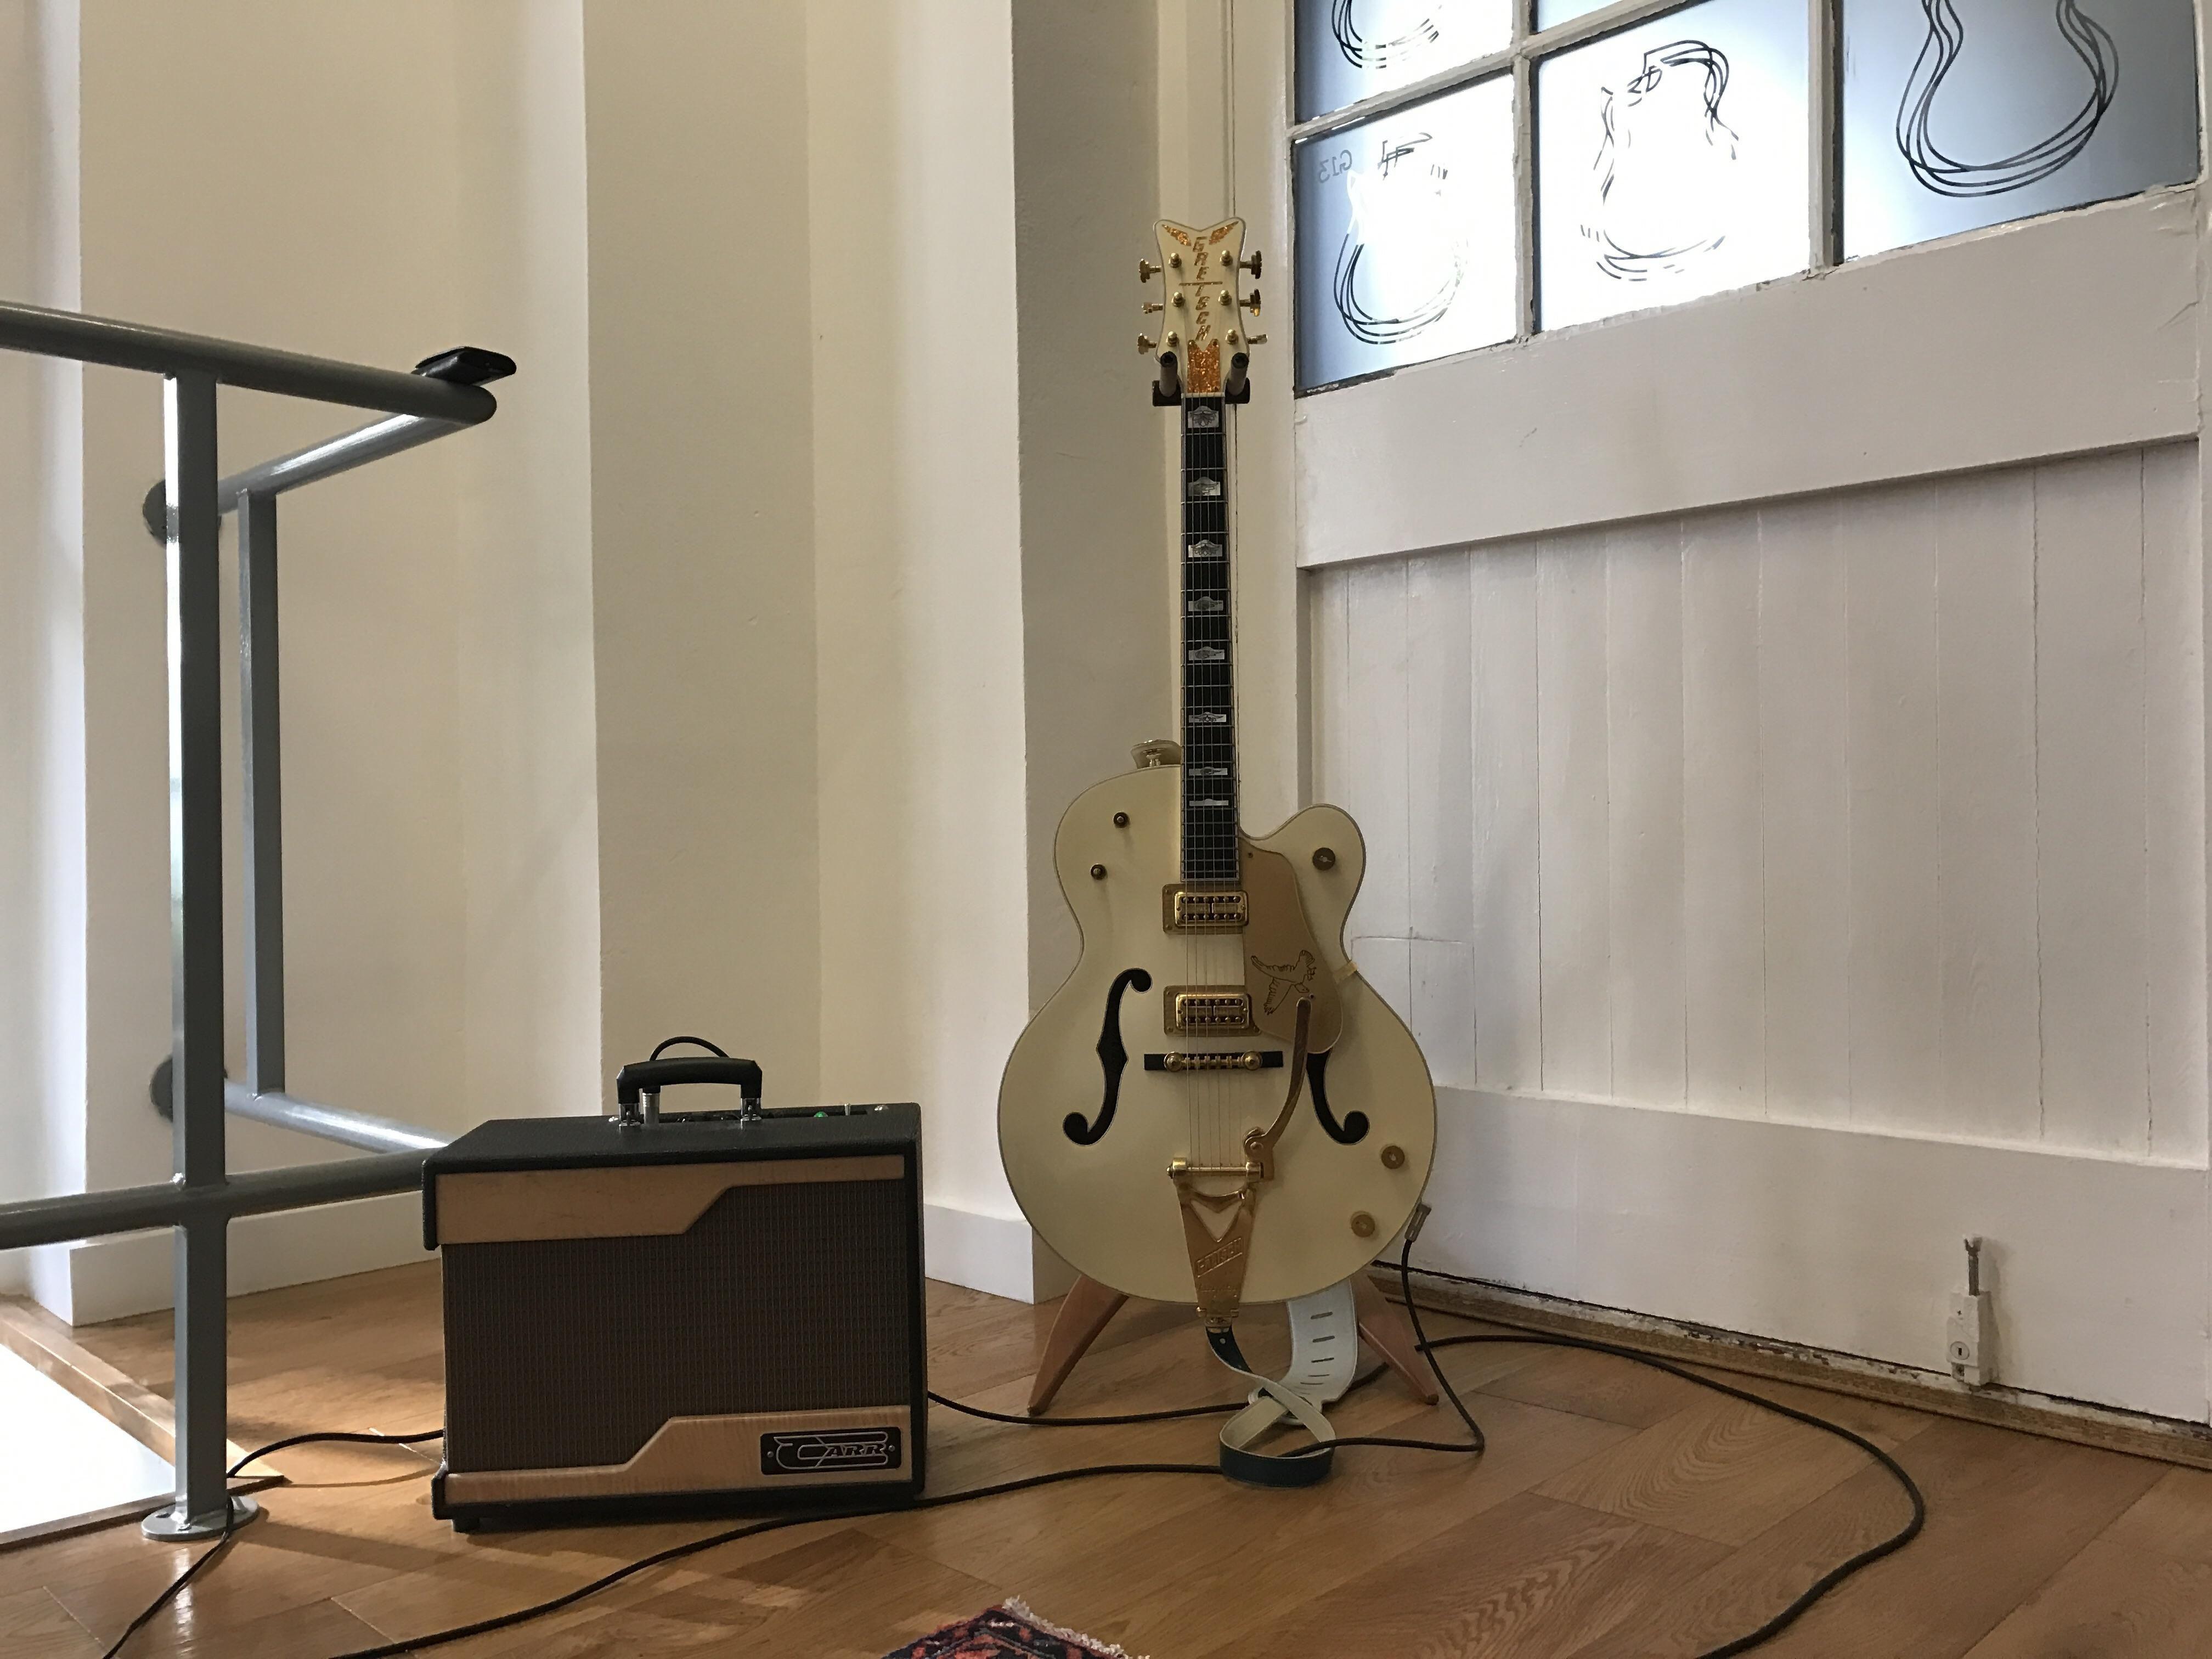 dating Gretsch gitarer hekte oransje fylke